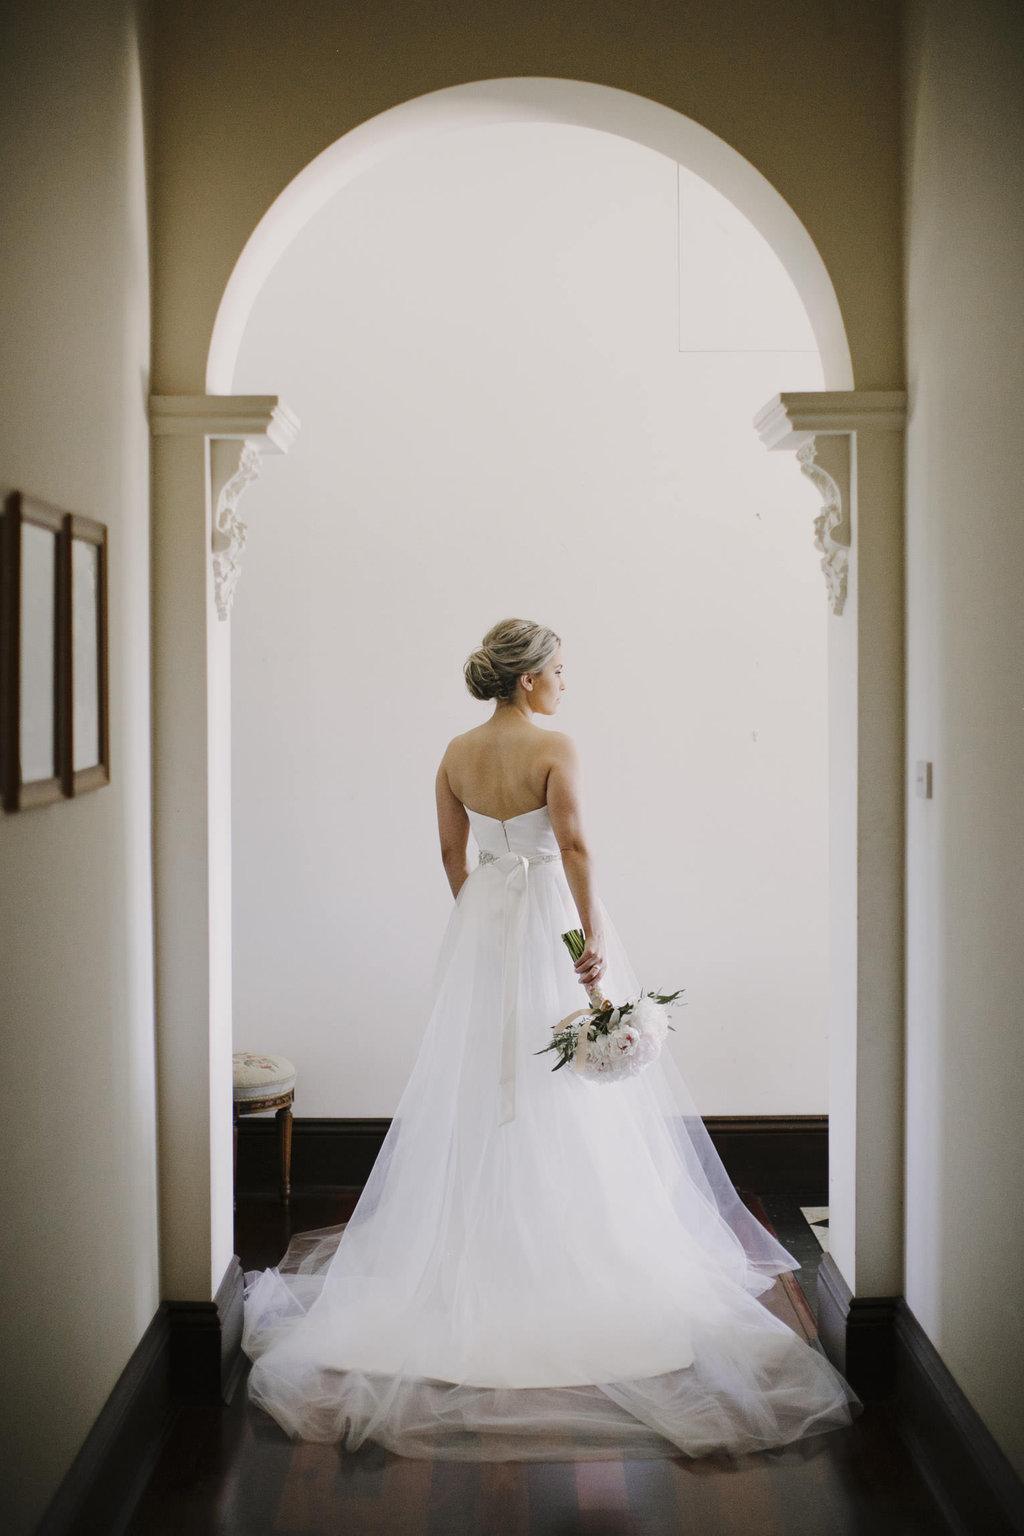 161106_justinaaron_wedding_fraiah_shaun_pr-10.jpg